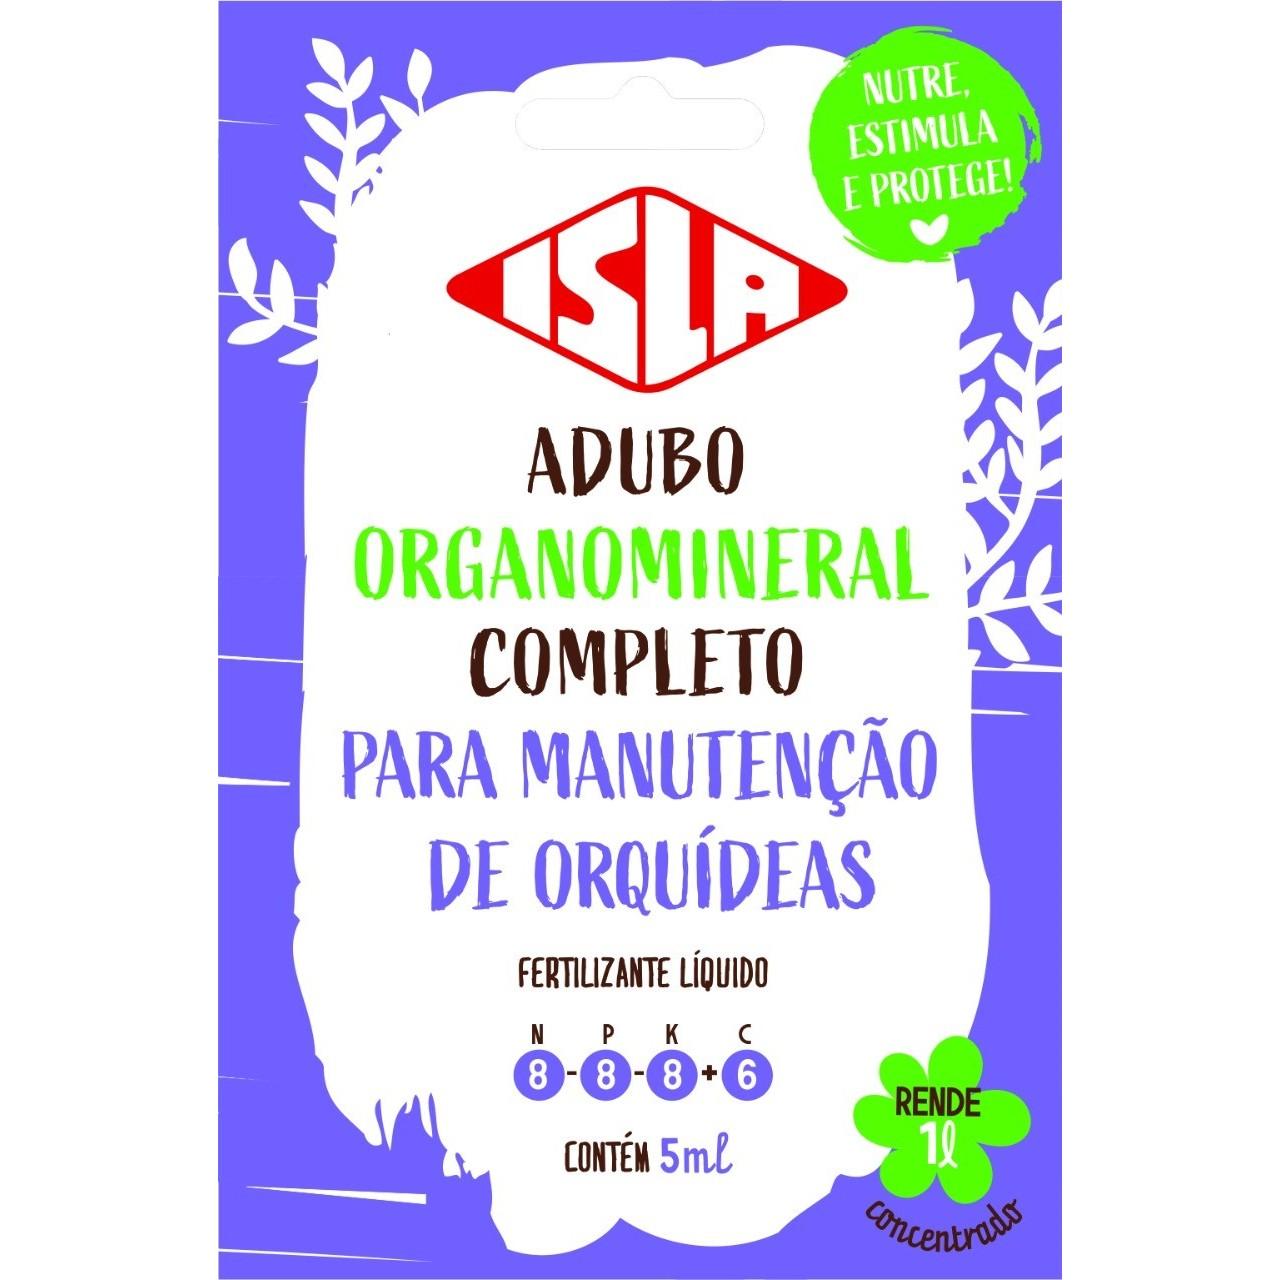 Fertilizante Organomineral para Orquideas 5ml - Isla Sementes